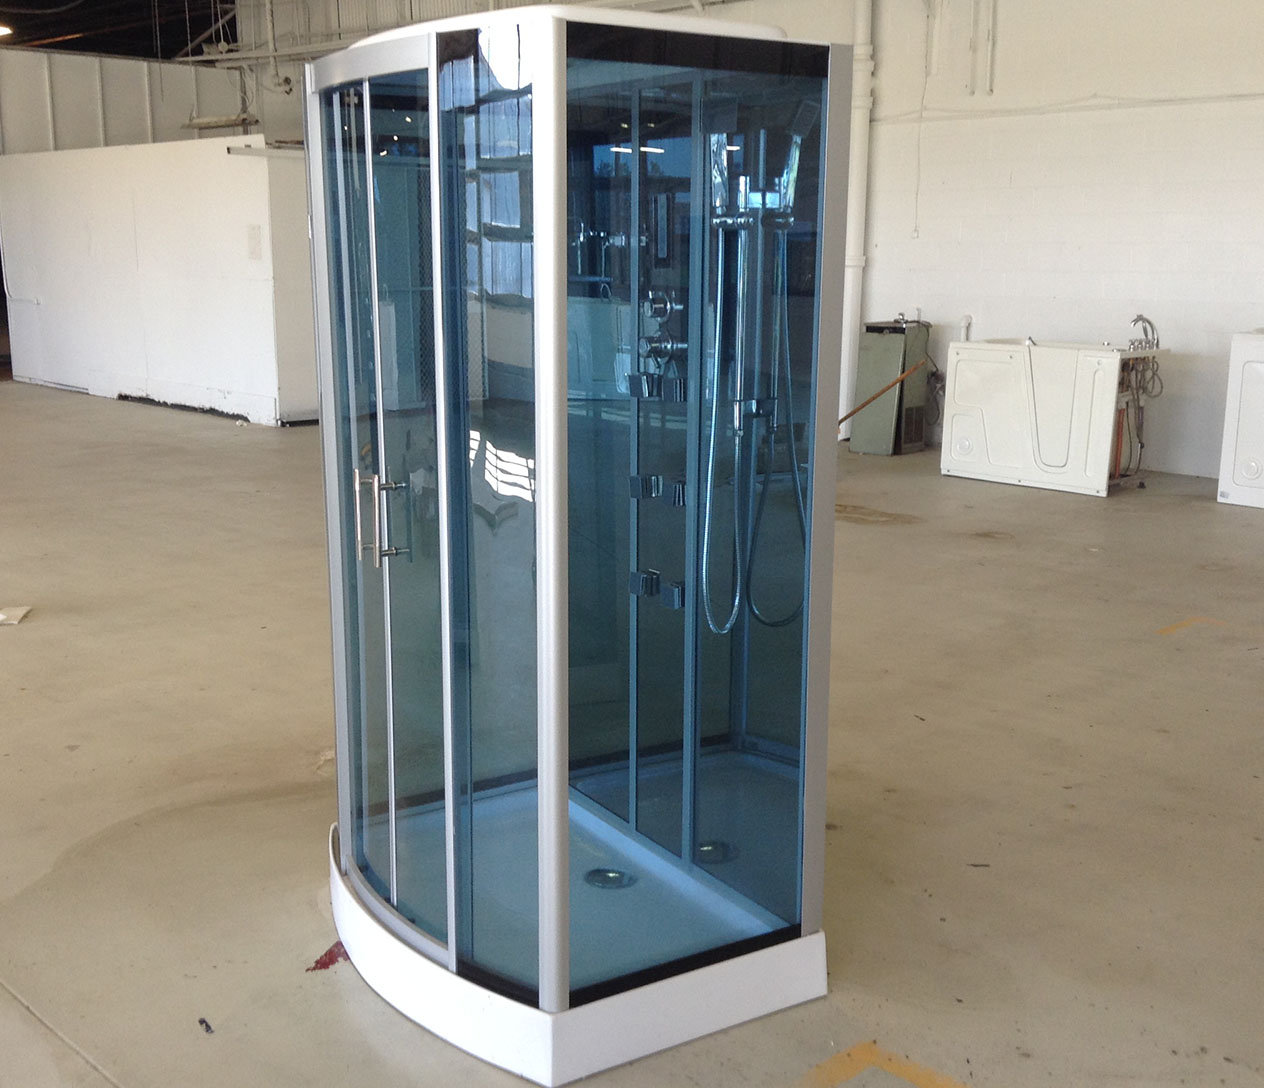 H-35 Hydro Shower - Luxury Spas, Inc.